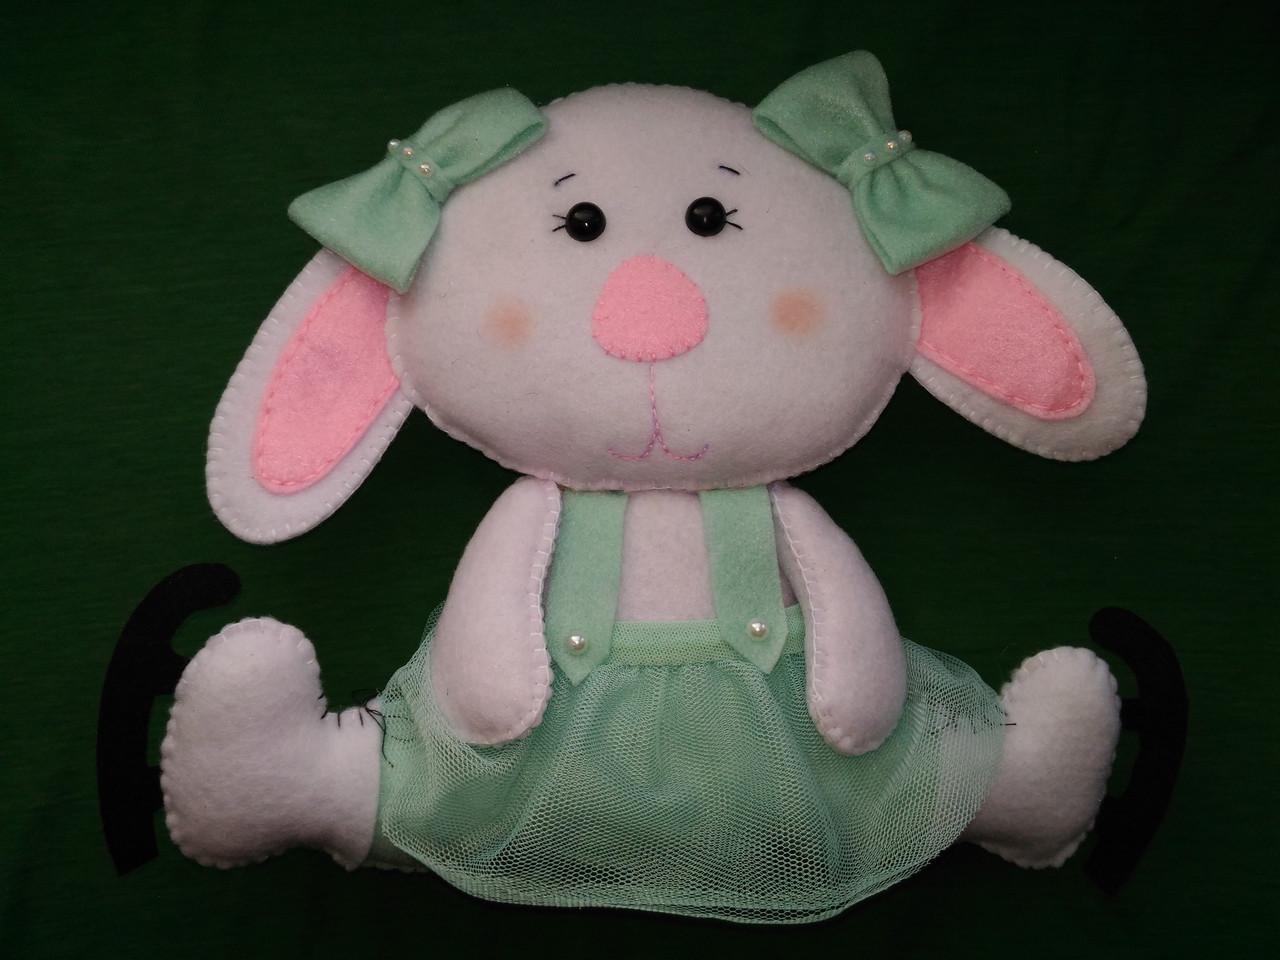 Мягкая игрушка заяц фигурист из фетра